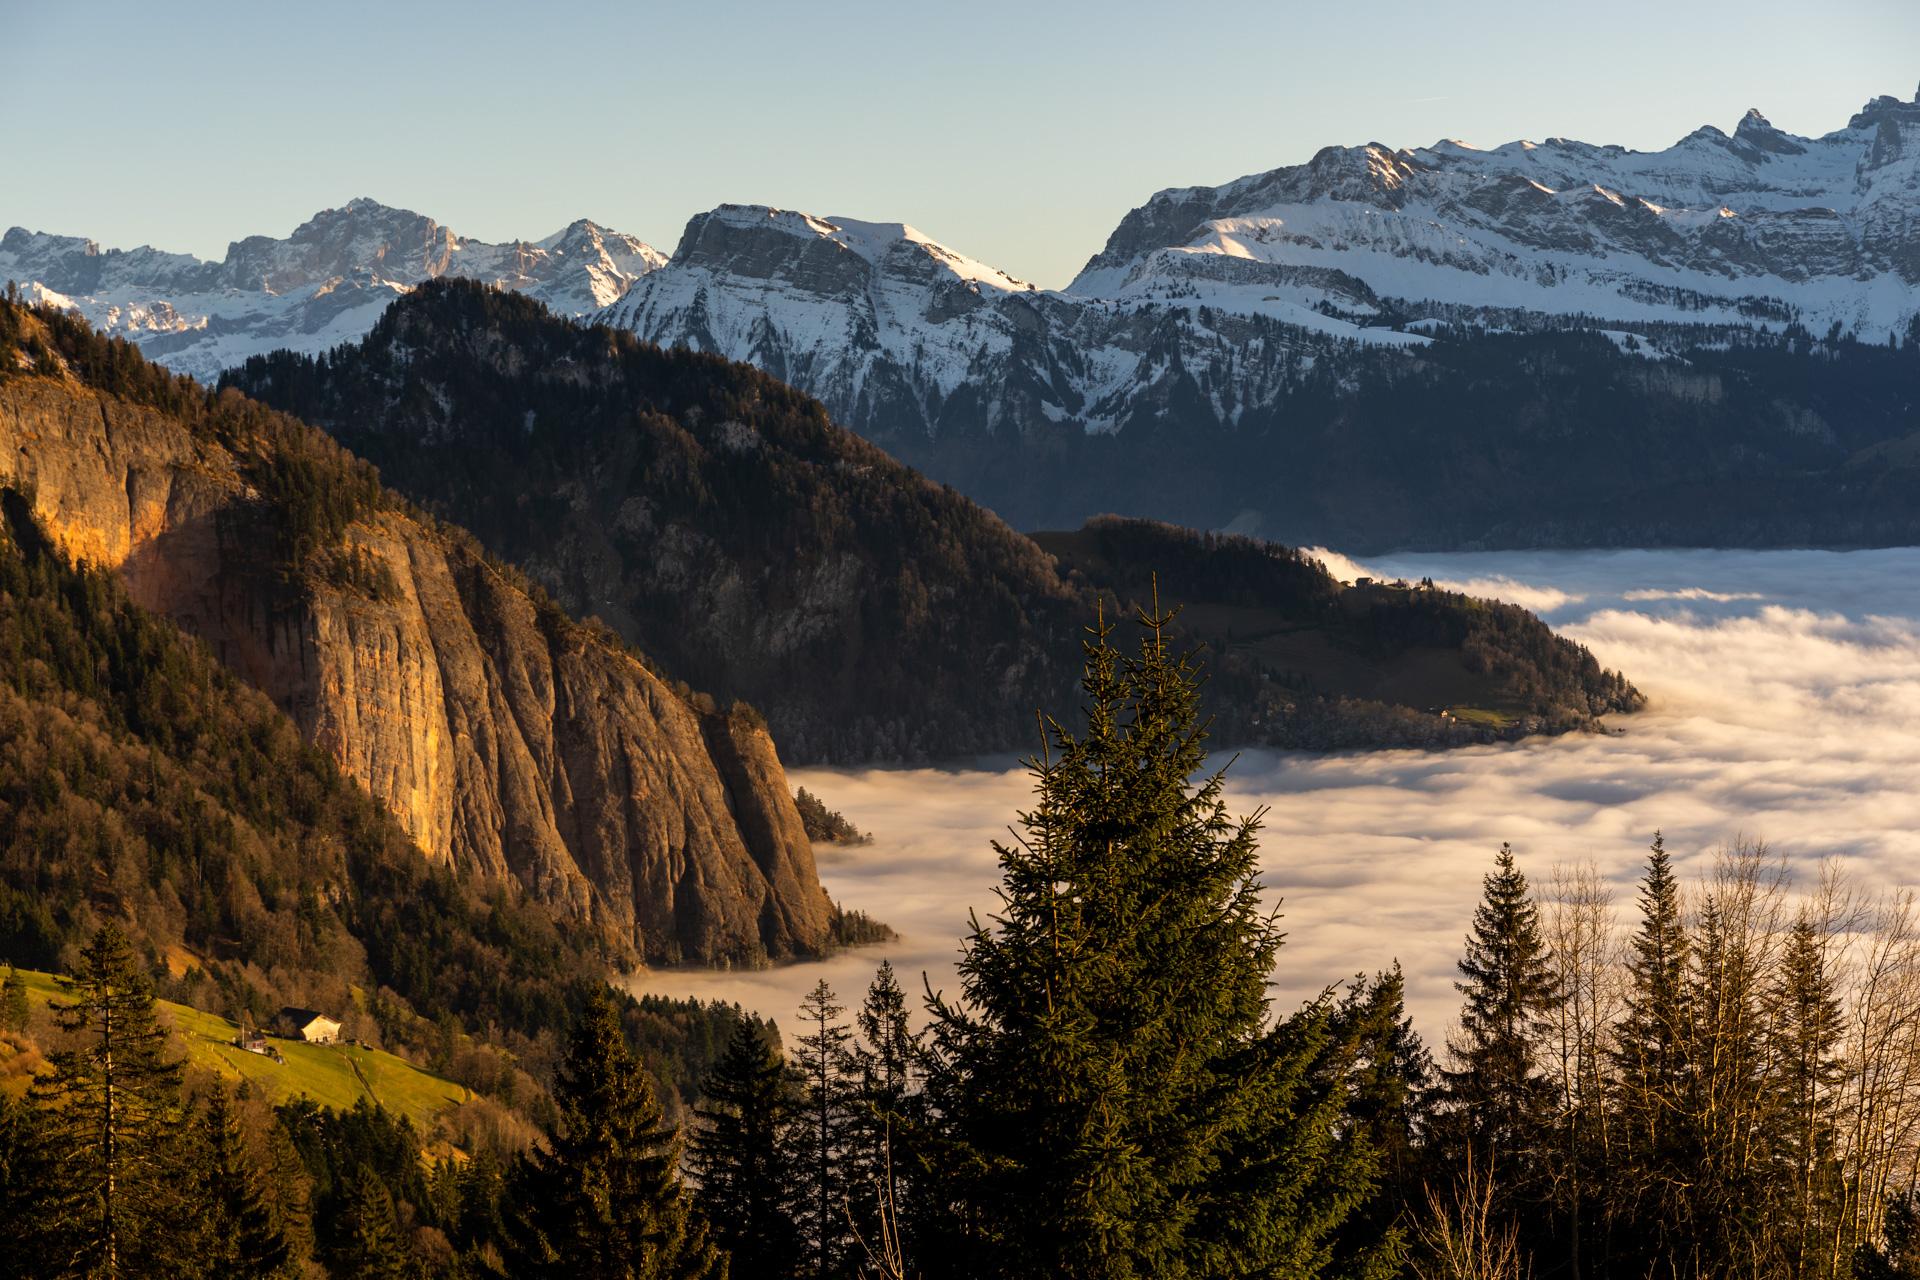 Rigi-Kaltbad, Switzerland